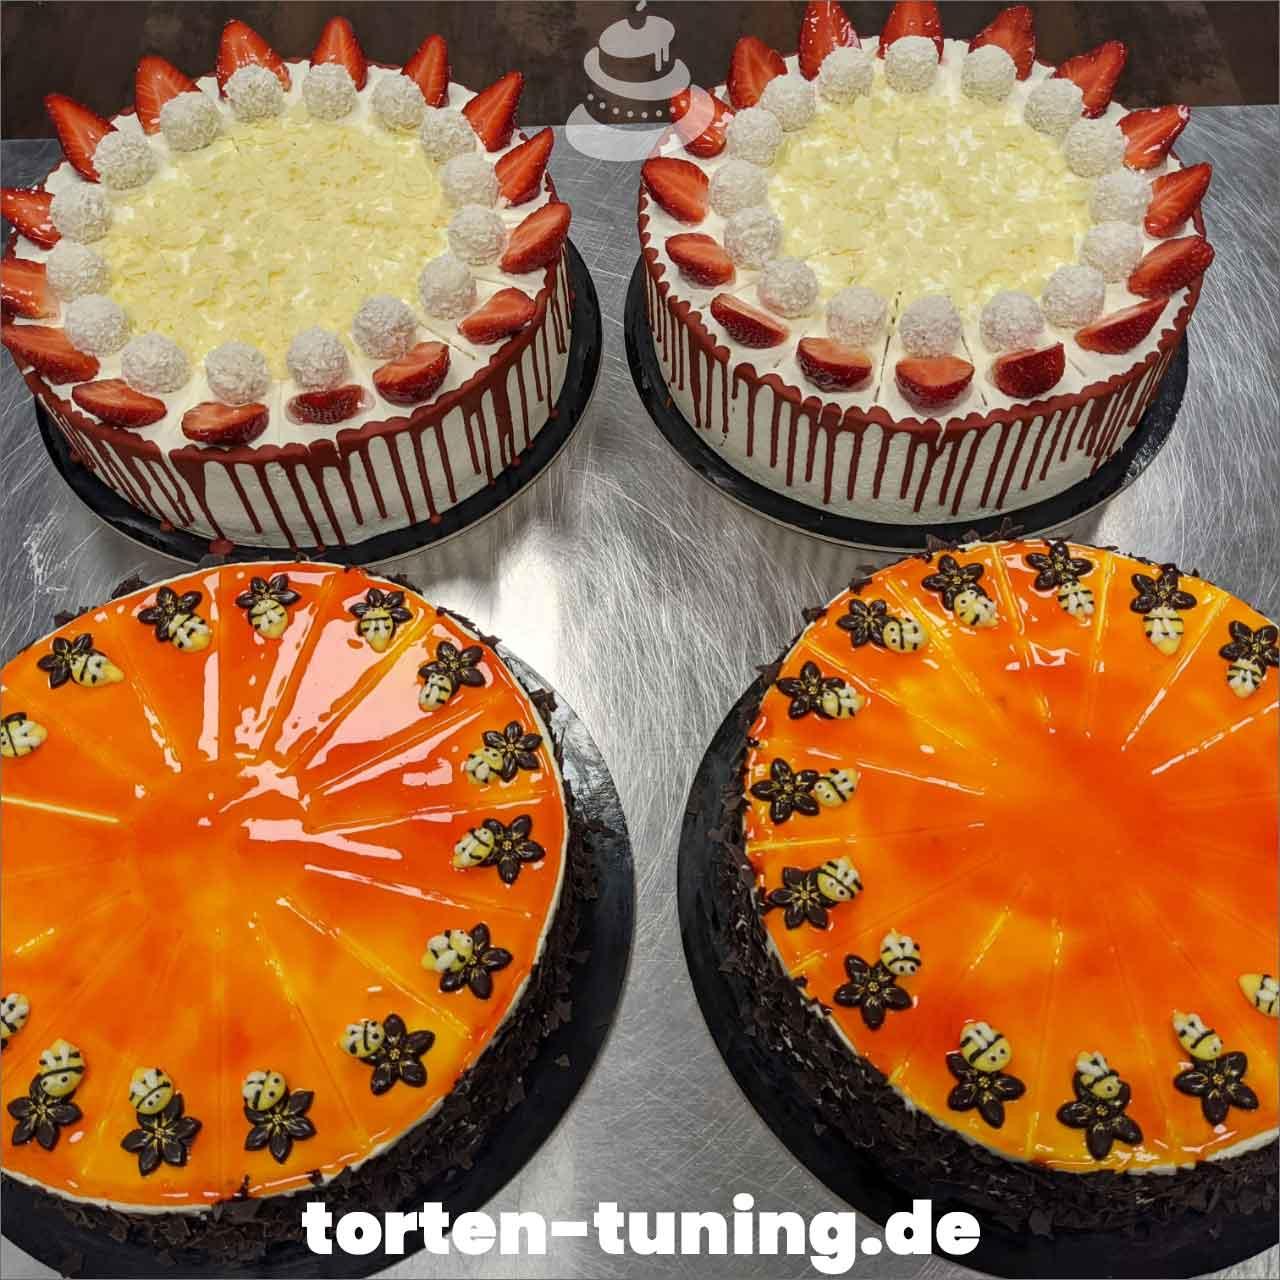 Frühlingstorten Raffaello Dripcake Obsttorte Geburtstagstorte Motivtorte Torte Tortendekoration Torte online bestellen Suhl Thüringen Torten Tuning Sahnetorte Tortenfiguren Cake Topper